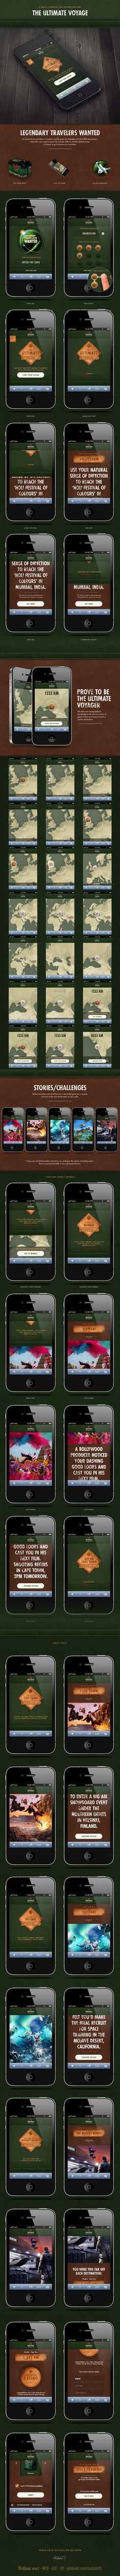 A Mobile in browser code redemption game for Heineken by Robbin Cenijn *** #web #gui #behance